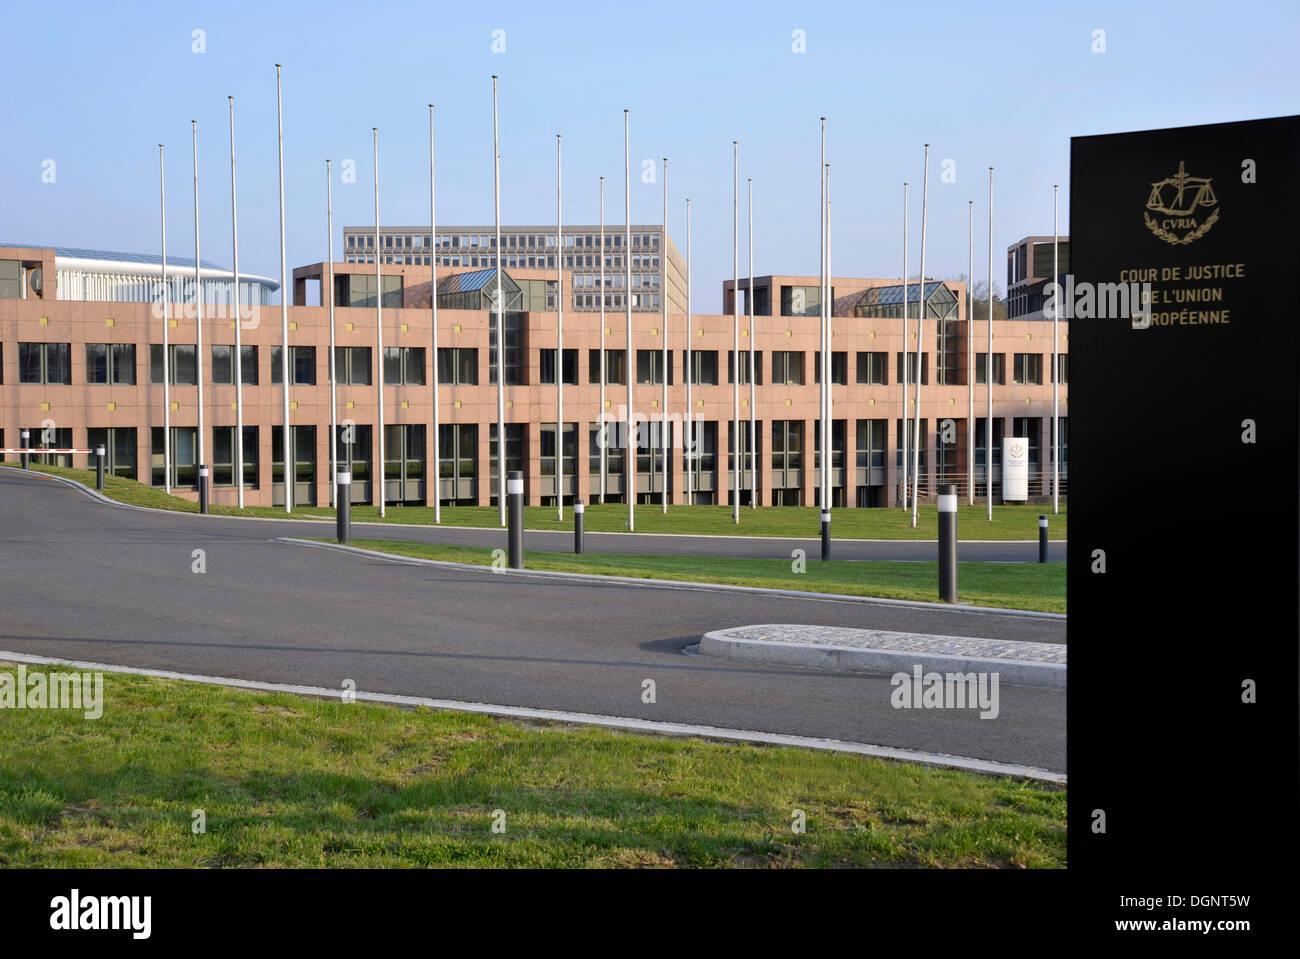 European Court of Justice, Boulevard Konrad Adenauer street, Kirchberg district, city of Luxembourg, Europe - Stock Image